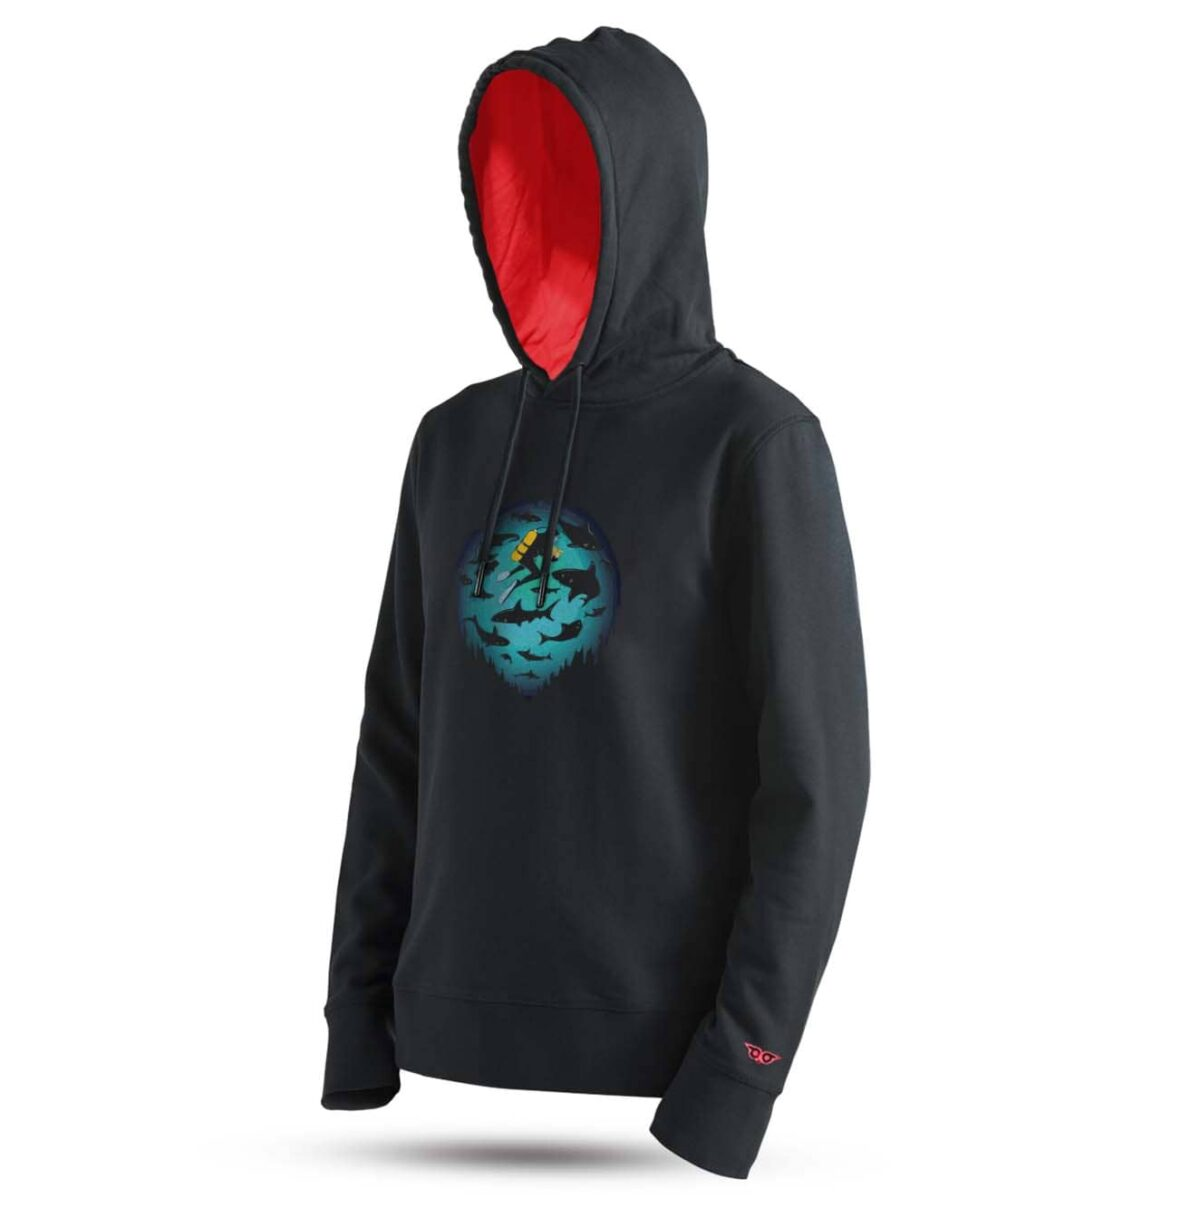 tarrzz-tasarim-kapsonlu-sweatshirt-dalgic-ve-kopekbalikli-deniz-baskili-sweatshirt